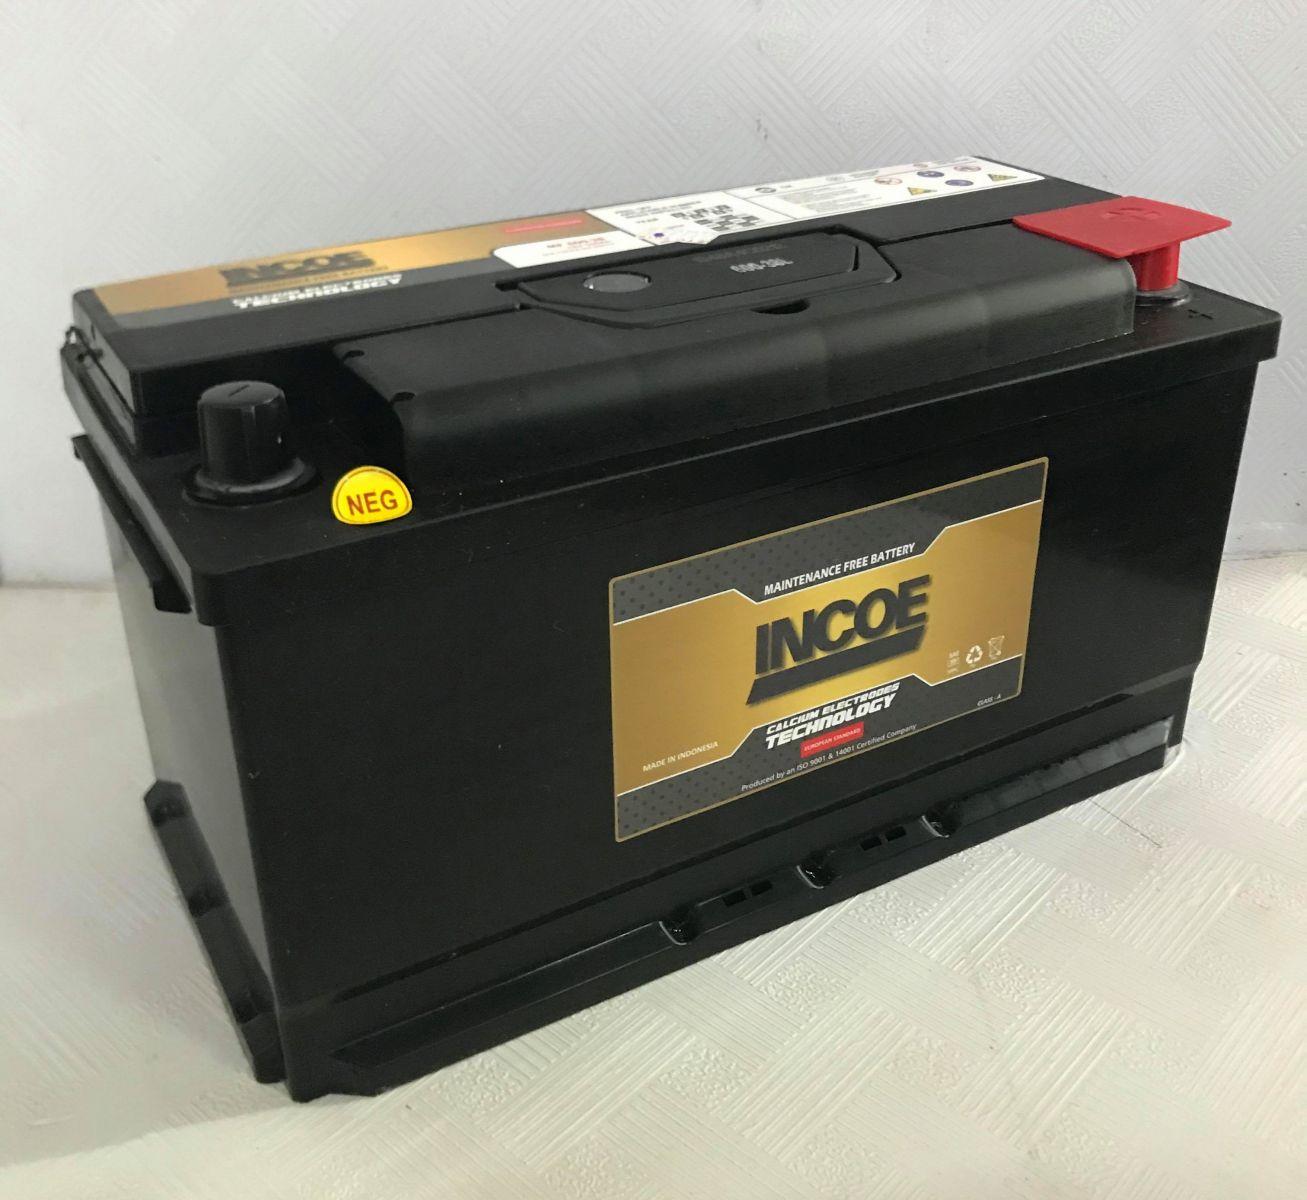 Ắc quy Incoe 100Ah MF 600-38